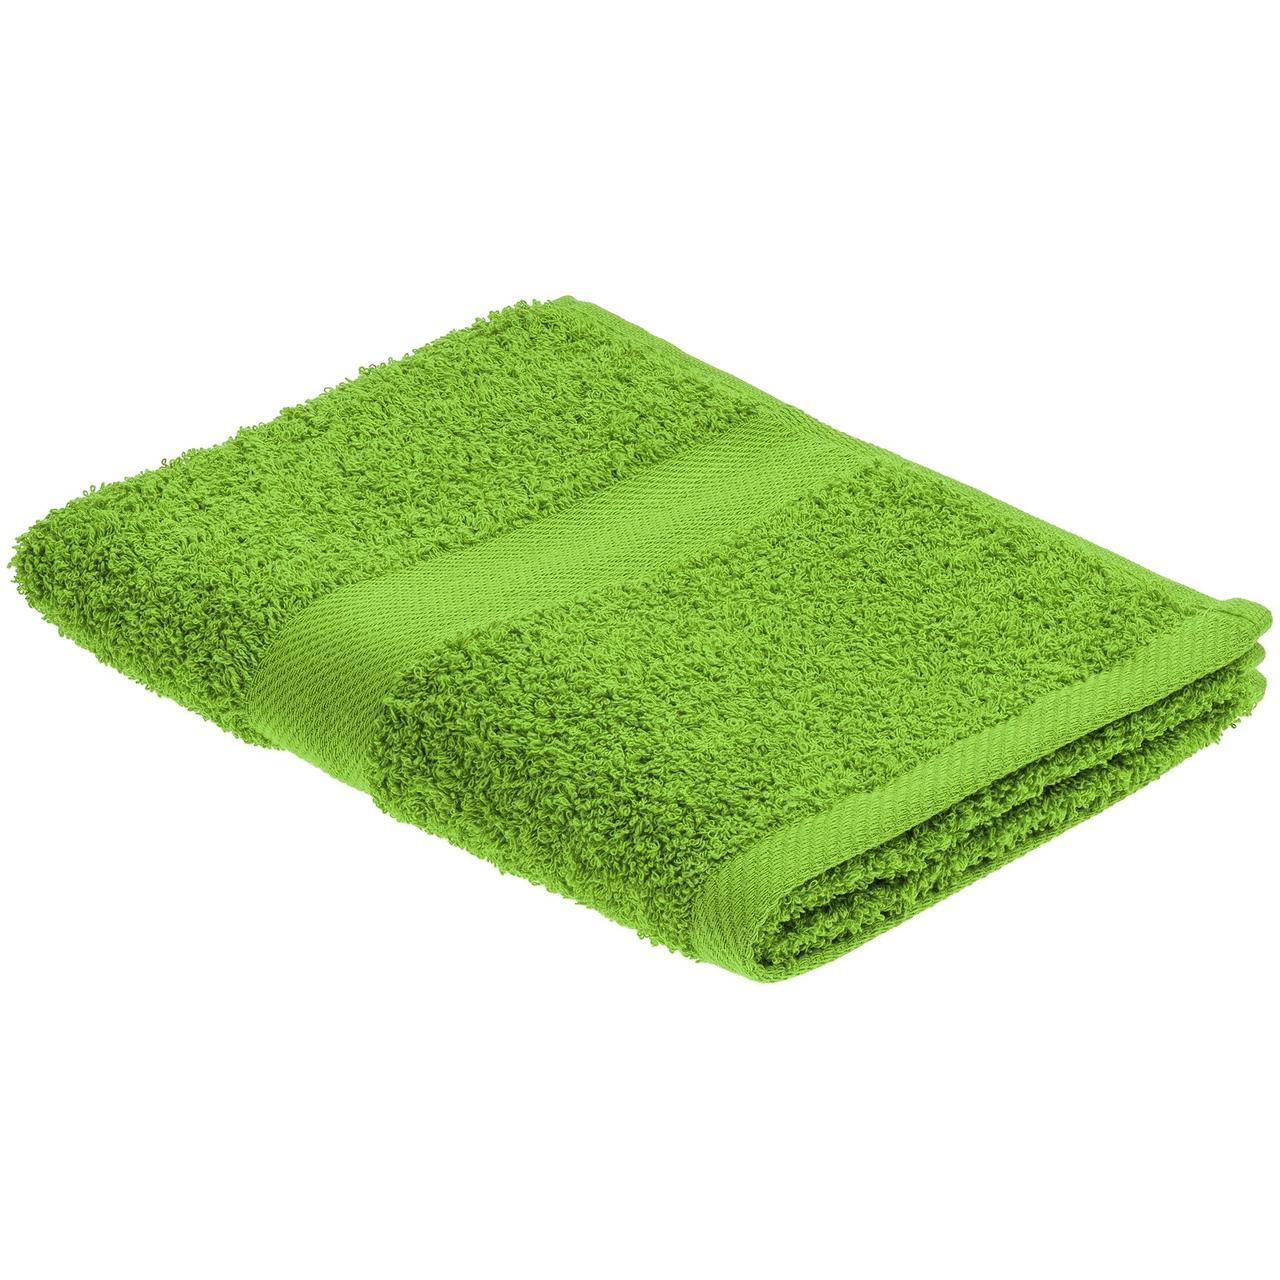 Полотенце Embrace, среднее, зеленое яблоко (артикул 20099.99)